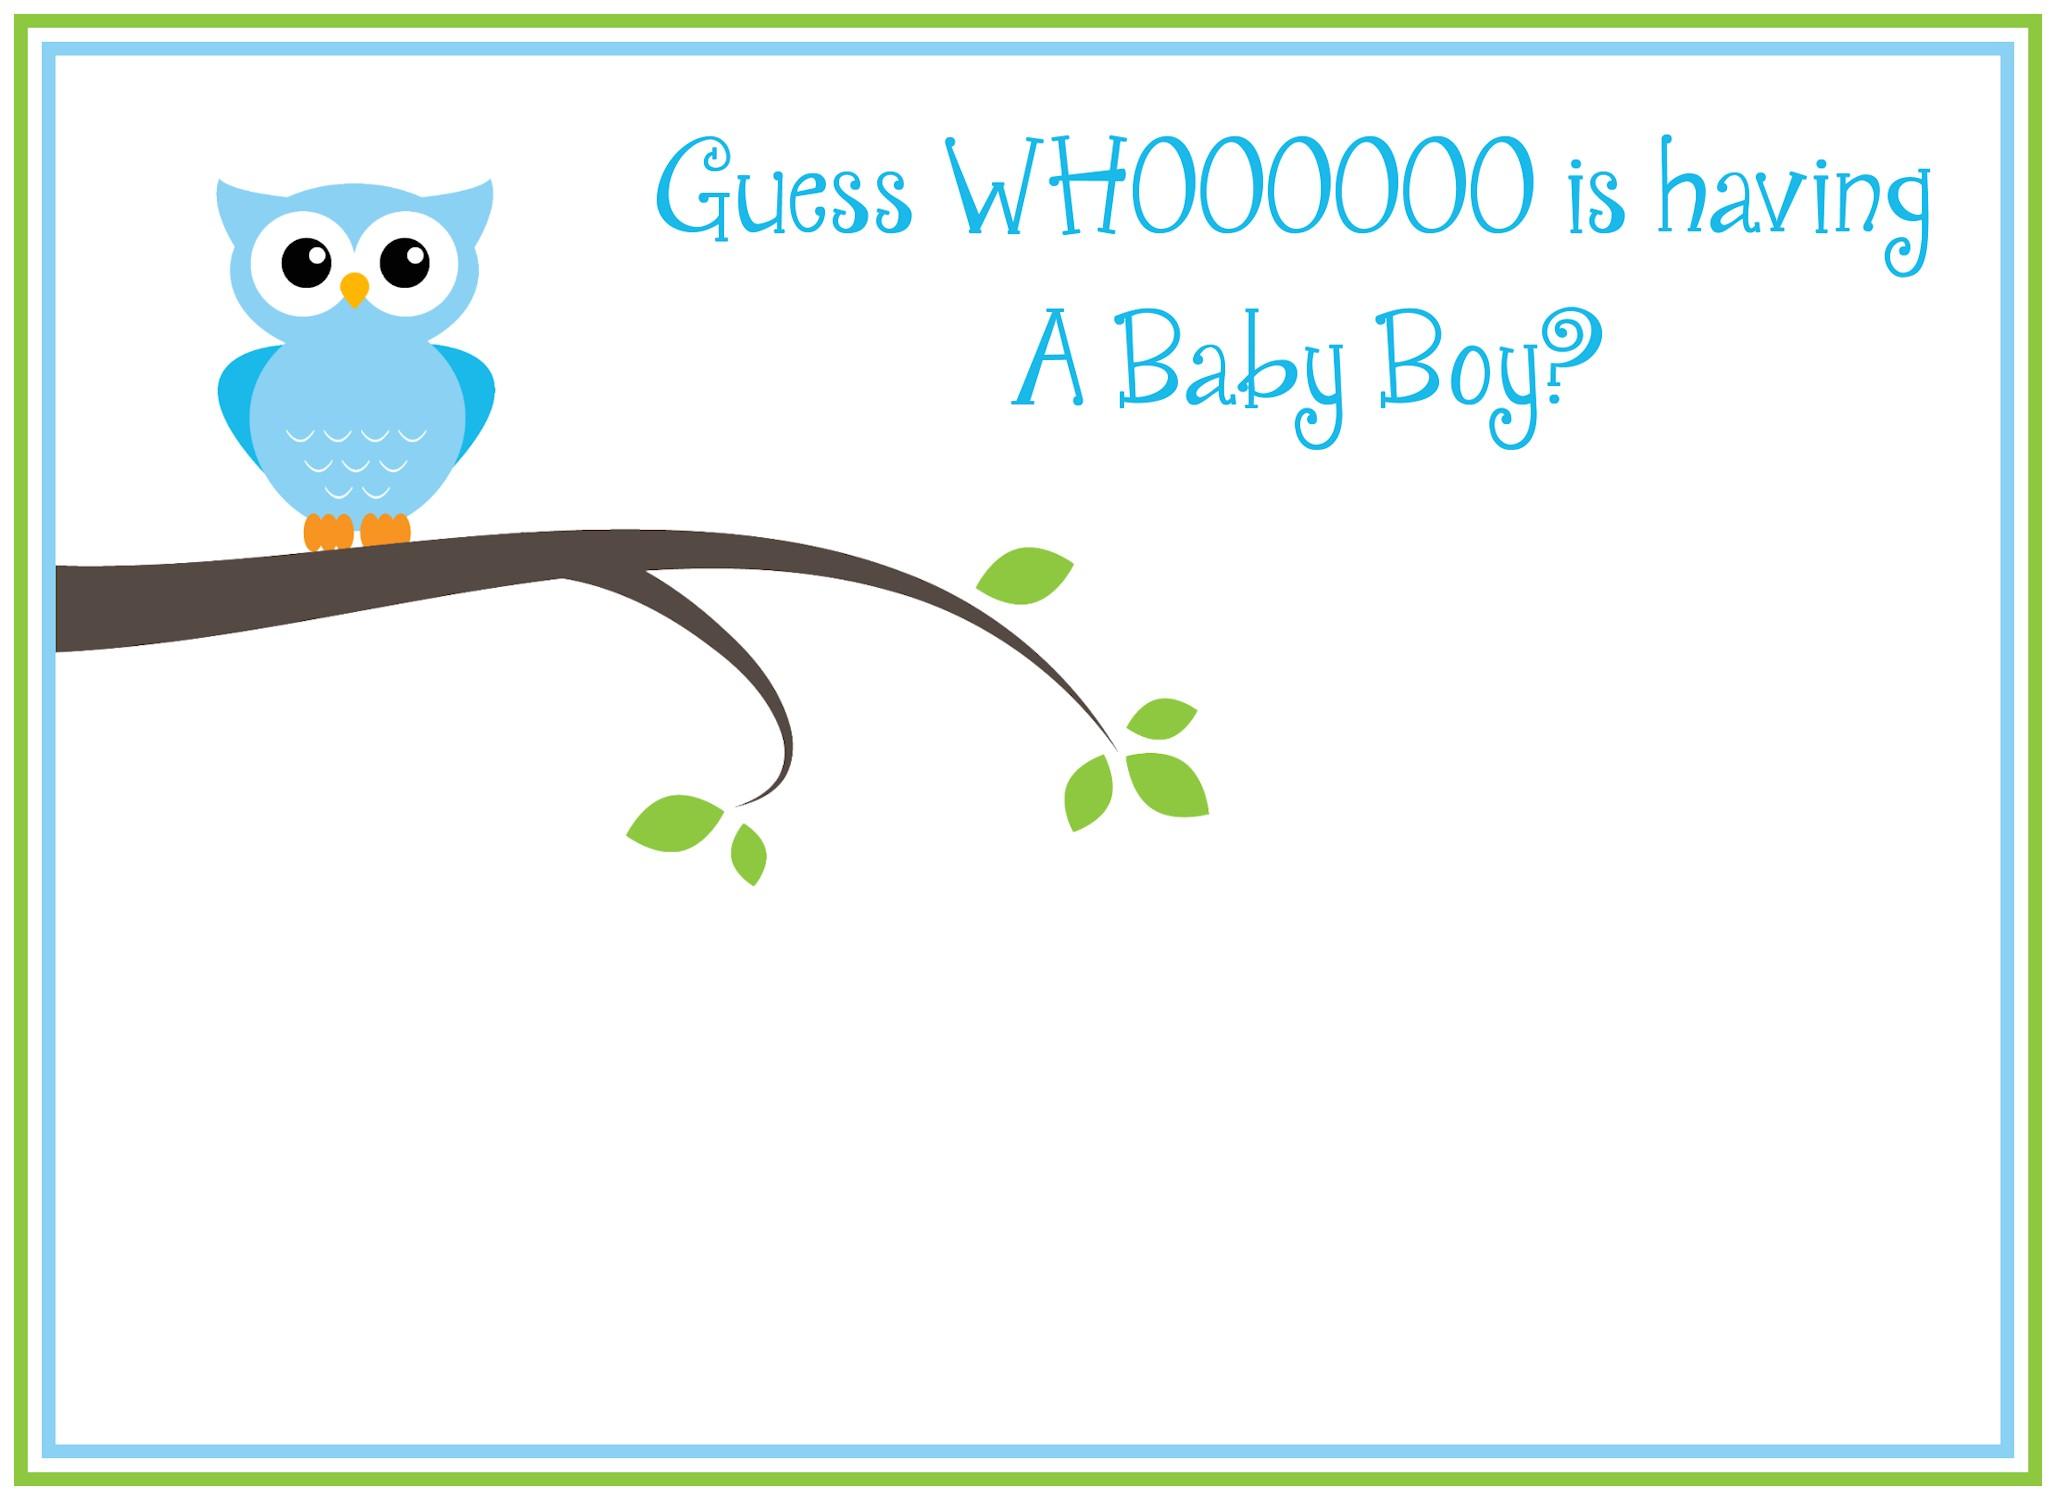 Free Printable Owl Baby Shower Invitations Free Printable Owl Baby Shower Invitations